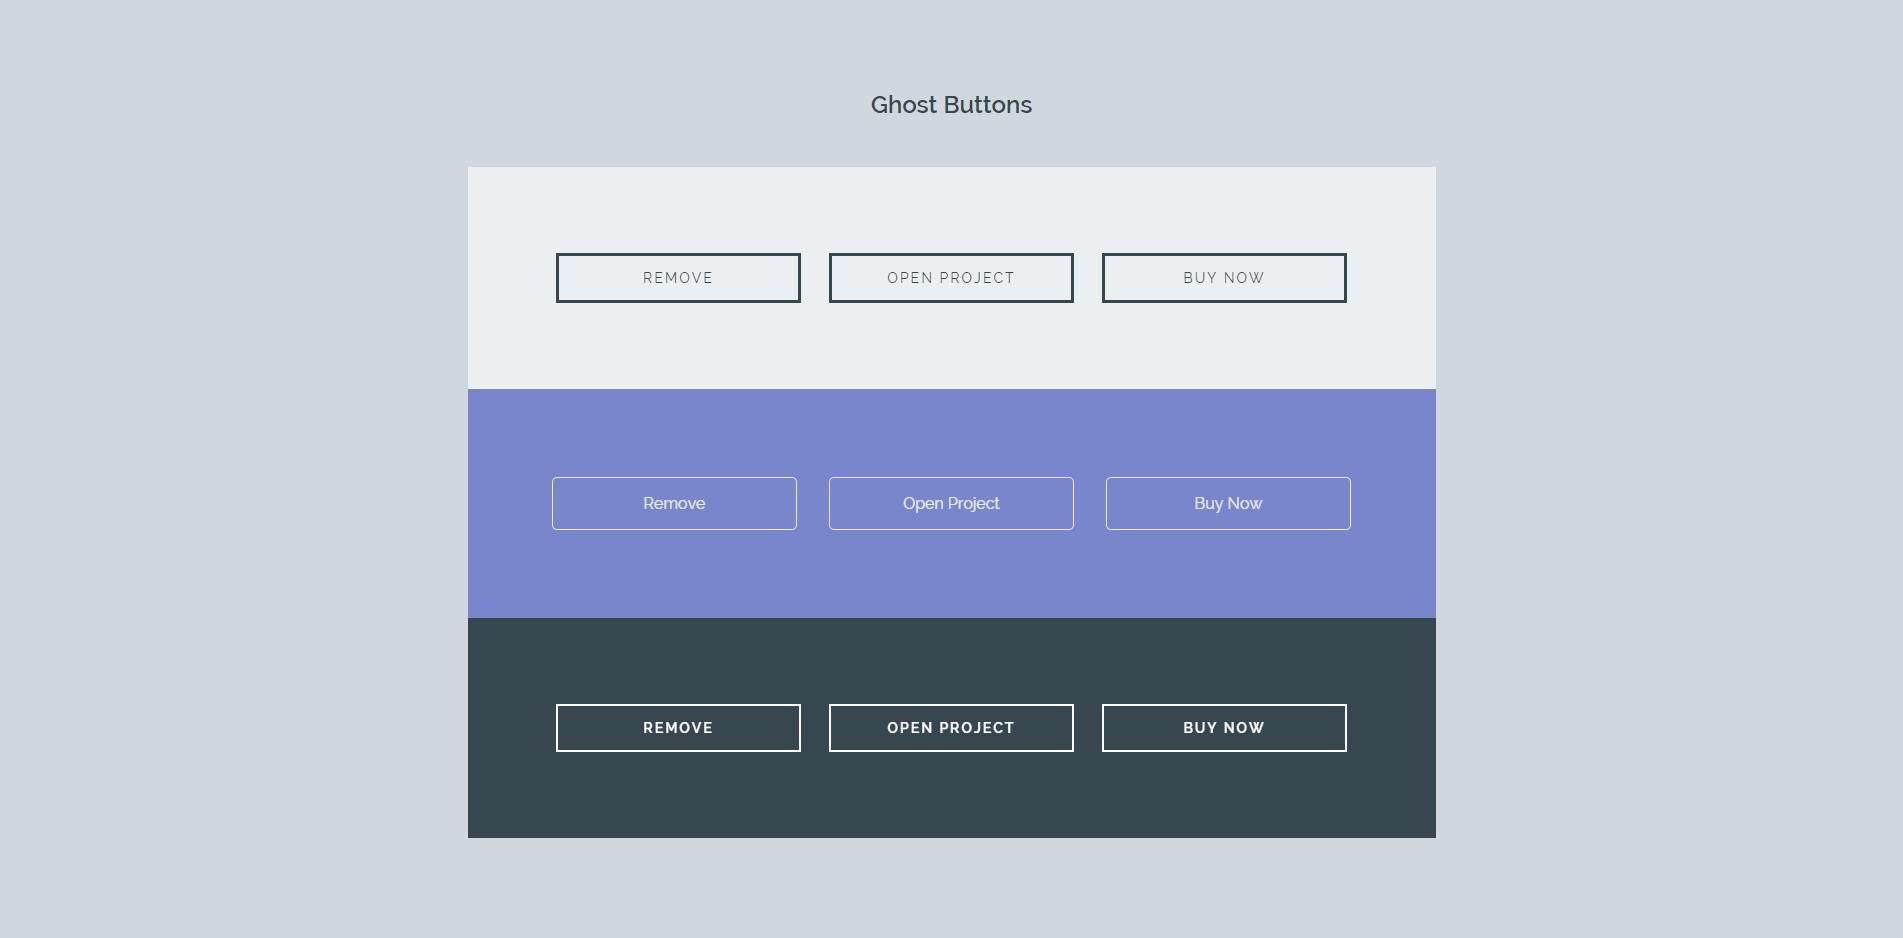 esempio trend web design ghost buttons